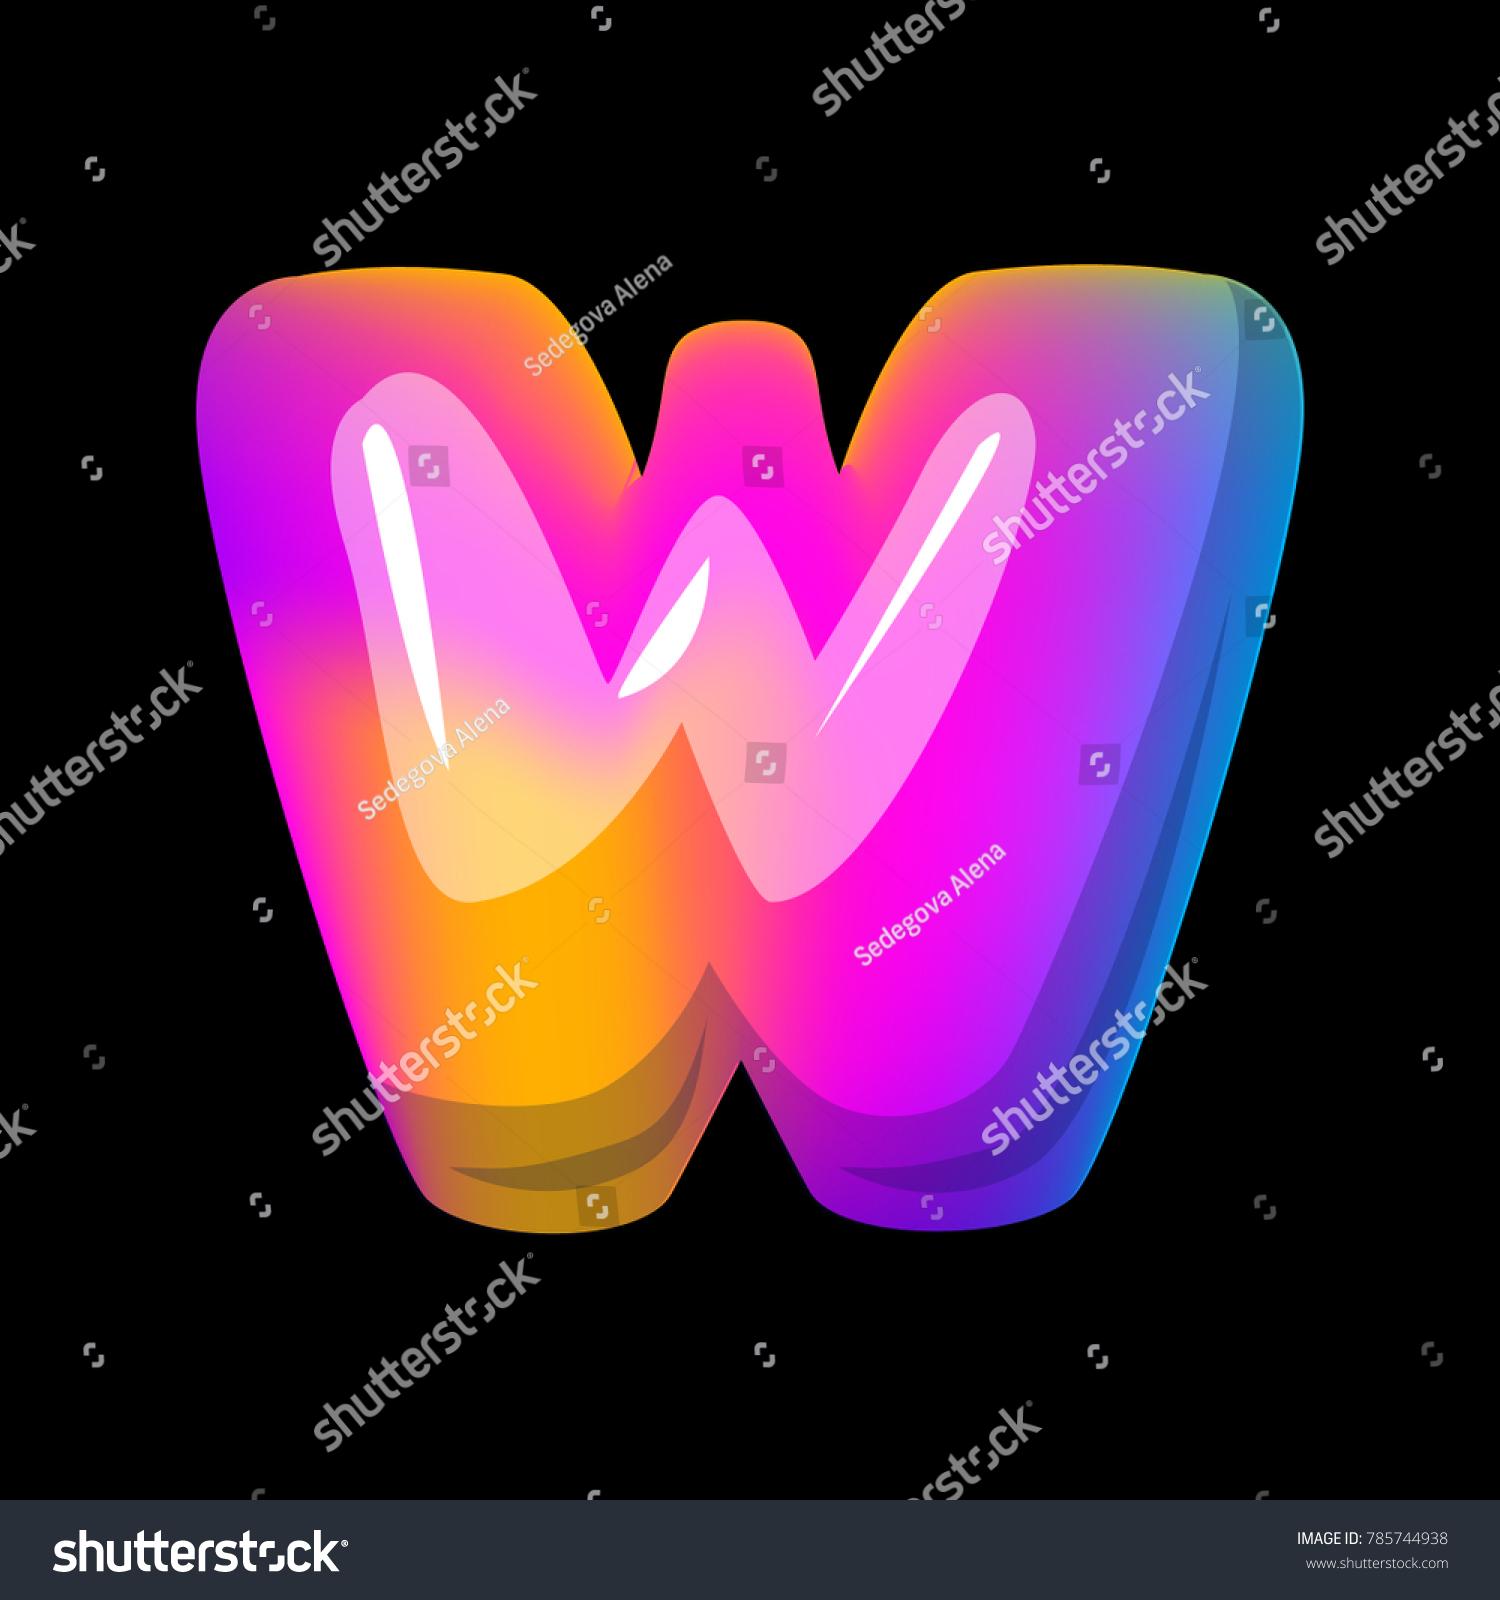 Vector Colorful Curvy Liquid 3 D Volumetric Stock Vector (Royalty ...